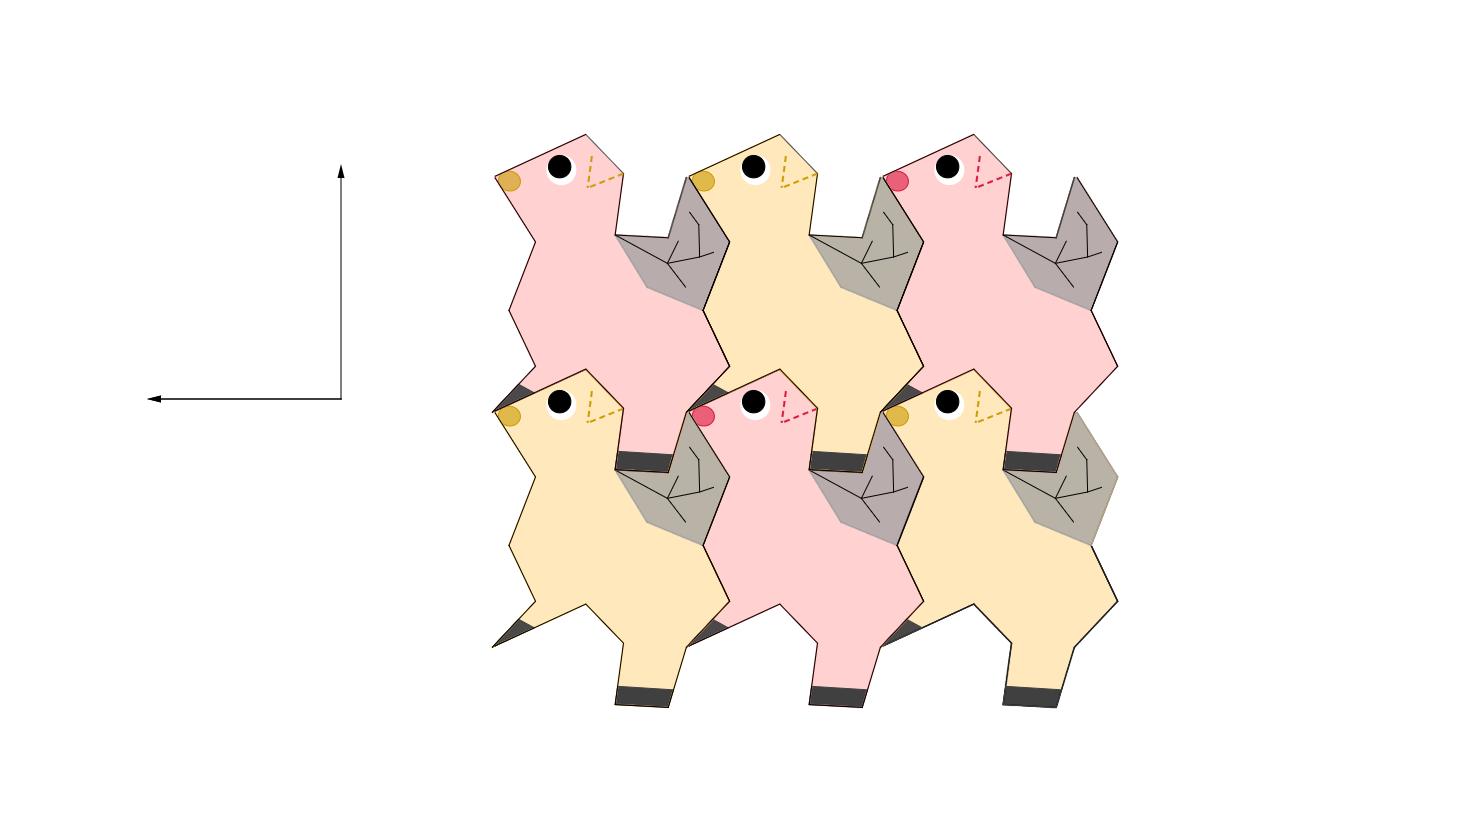 Tessellation Step 7: Polishing Up Your Tessellation